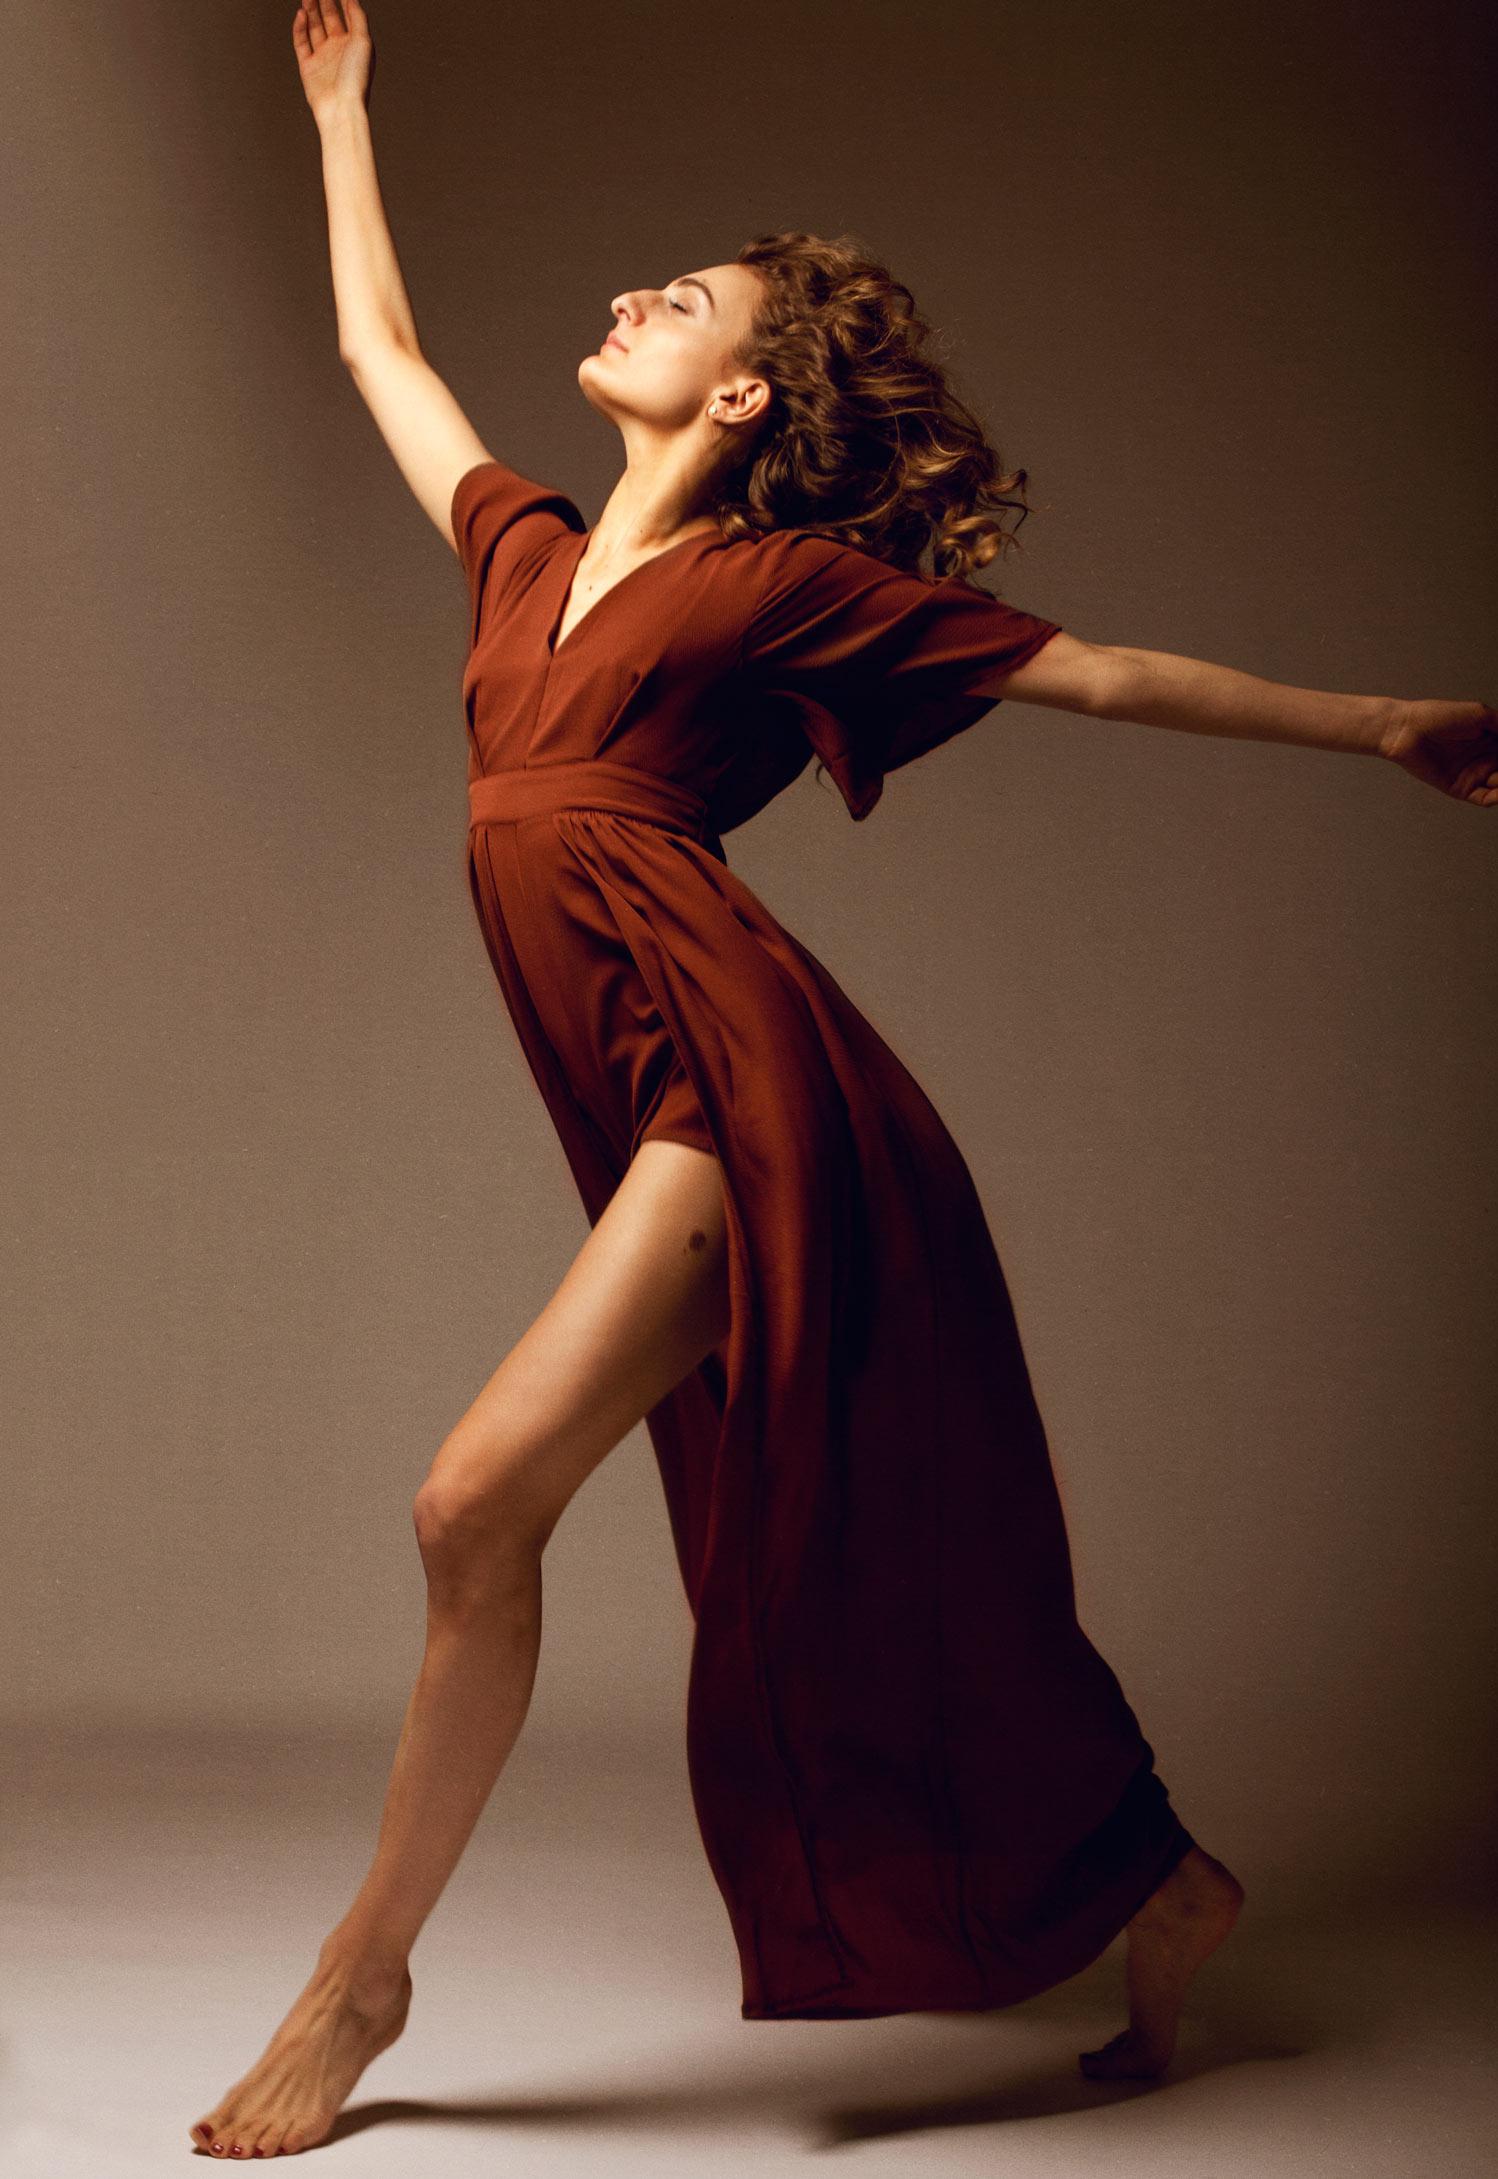 Photo plein pied en studio de gabriella papadakis dansant dans une robe vaporeuse